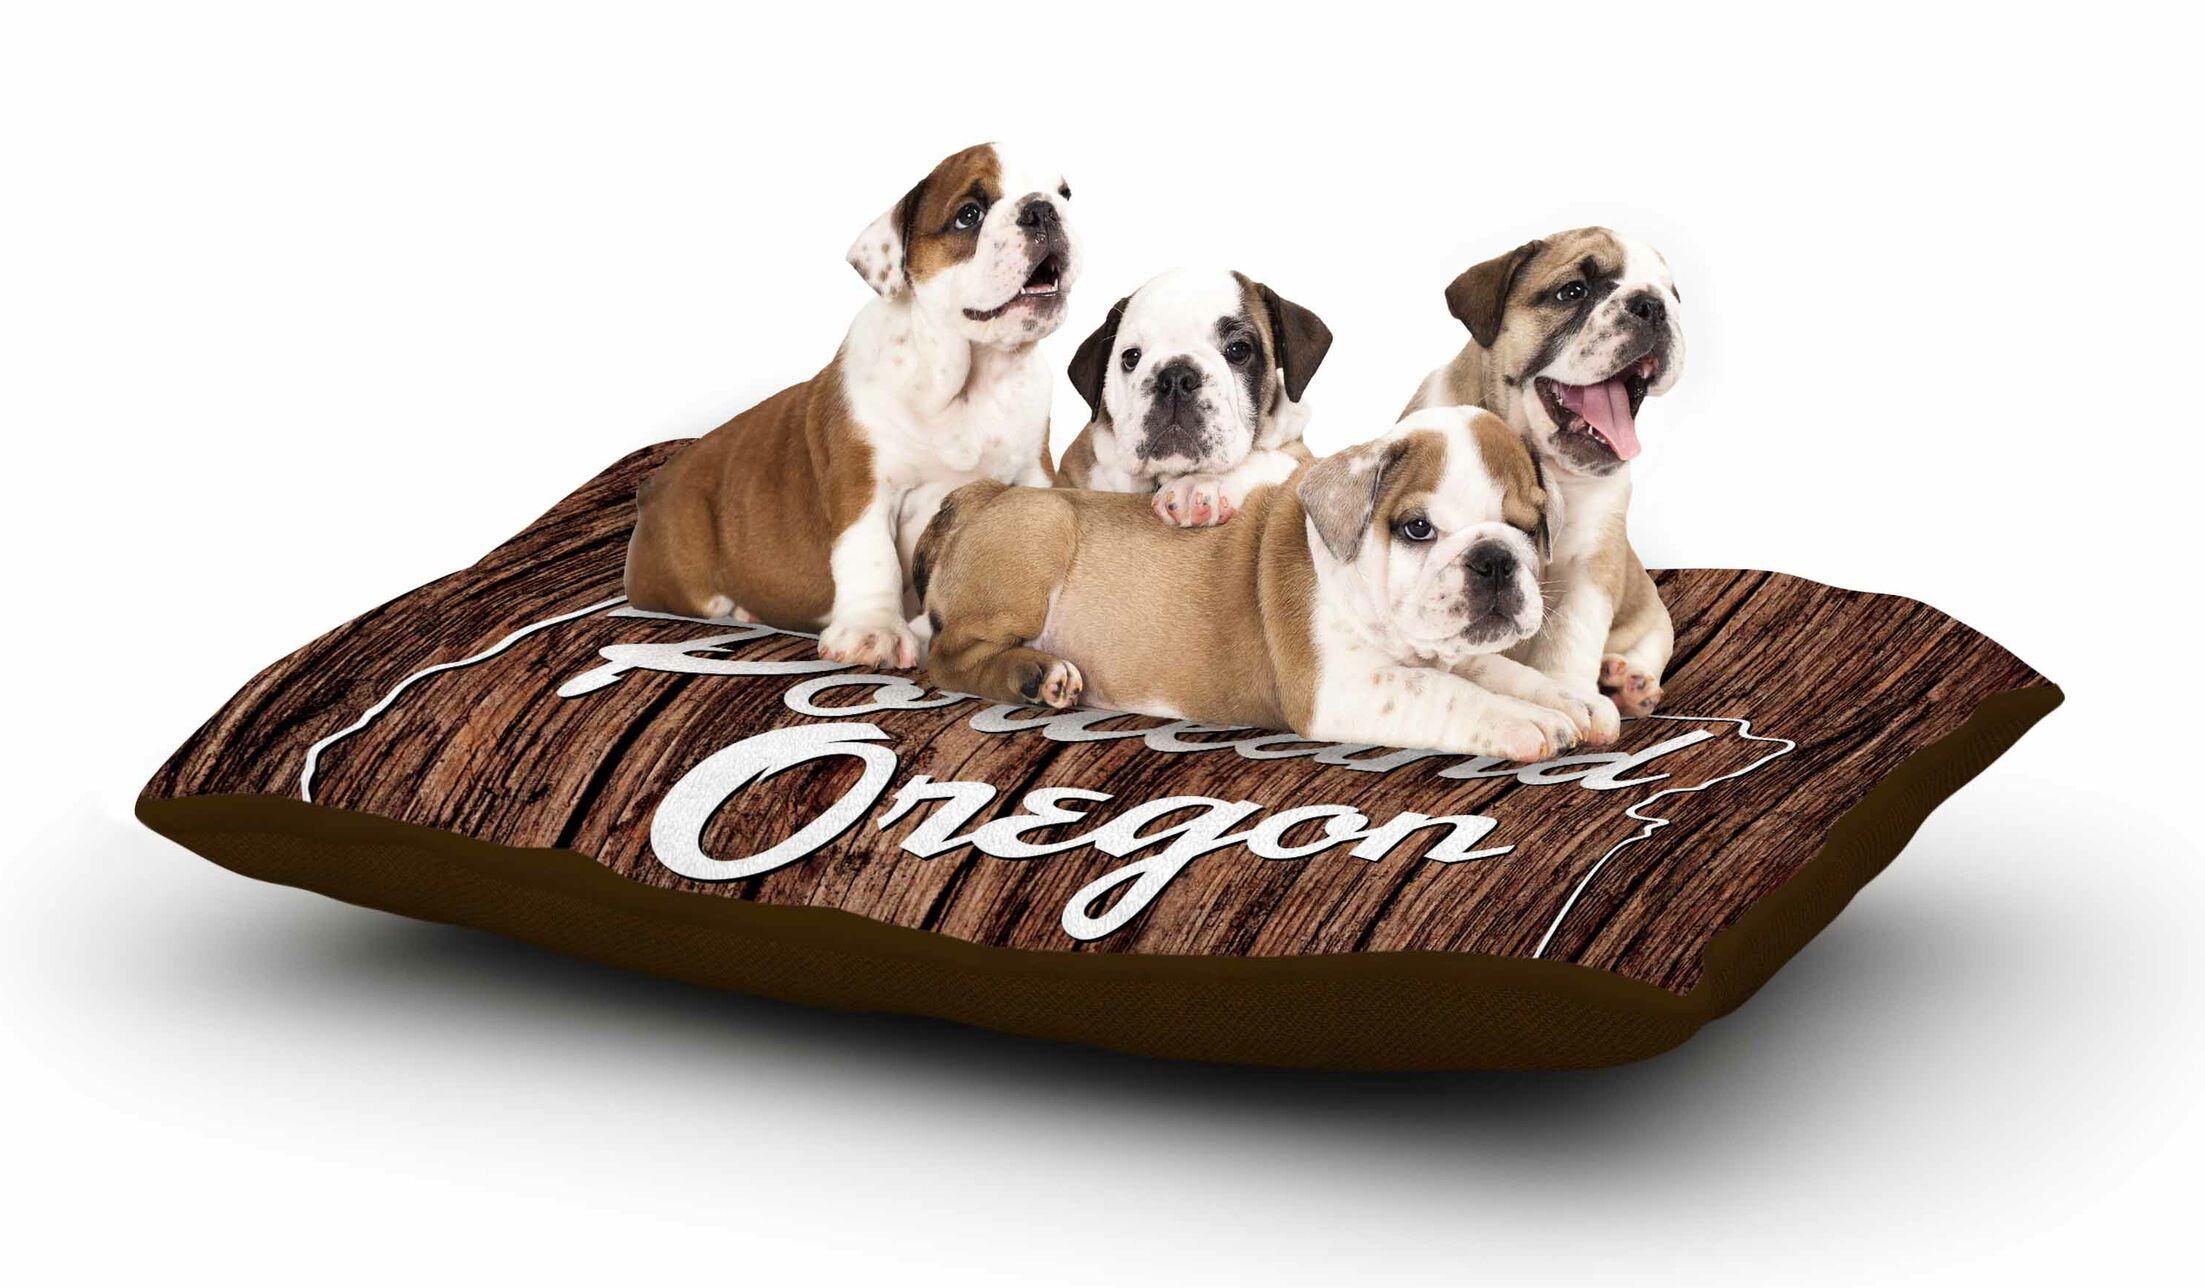 Juan Paolo 'Keep it Weird' Portland Dog Pillow with Fleece Cozy Top